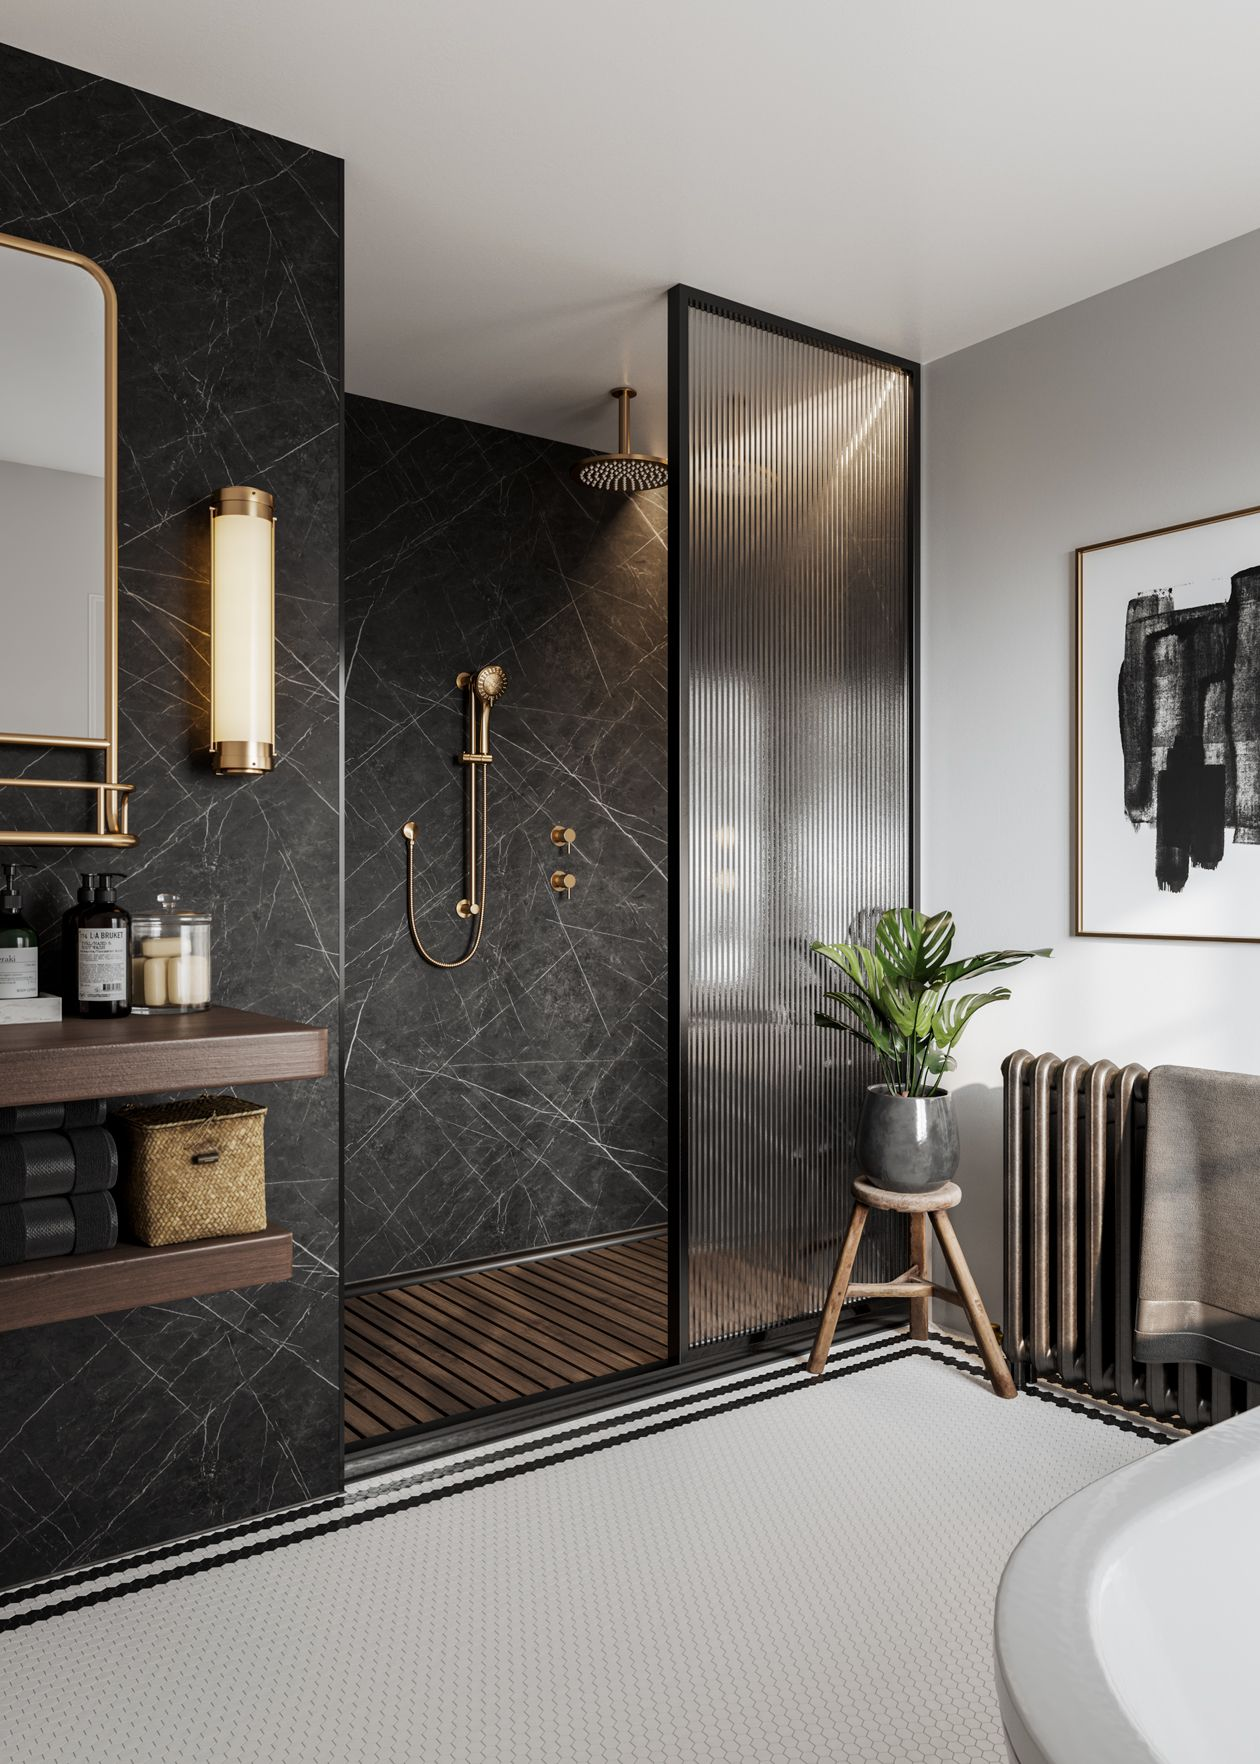 Black Marble Bathrooms In 2020 Black Marble Bathroom Bathroom Design Luxury Bathroom Interior Design